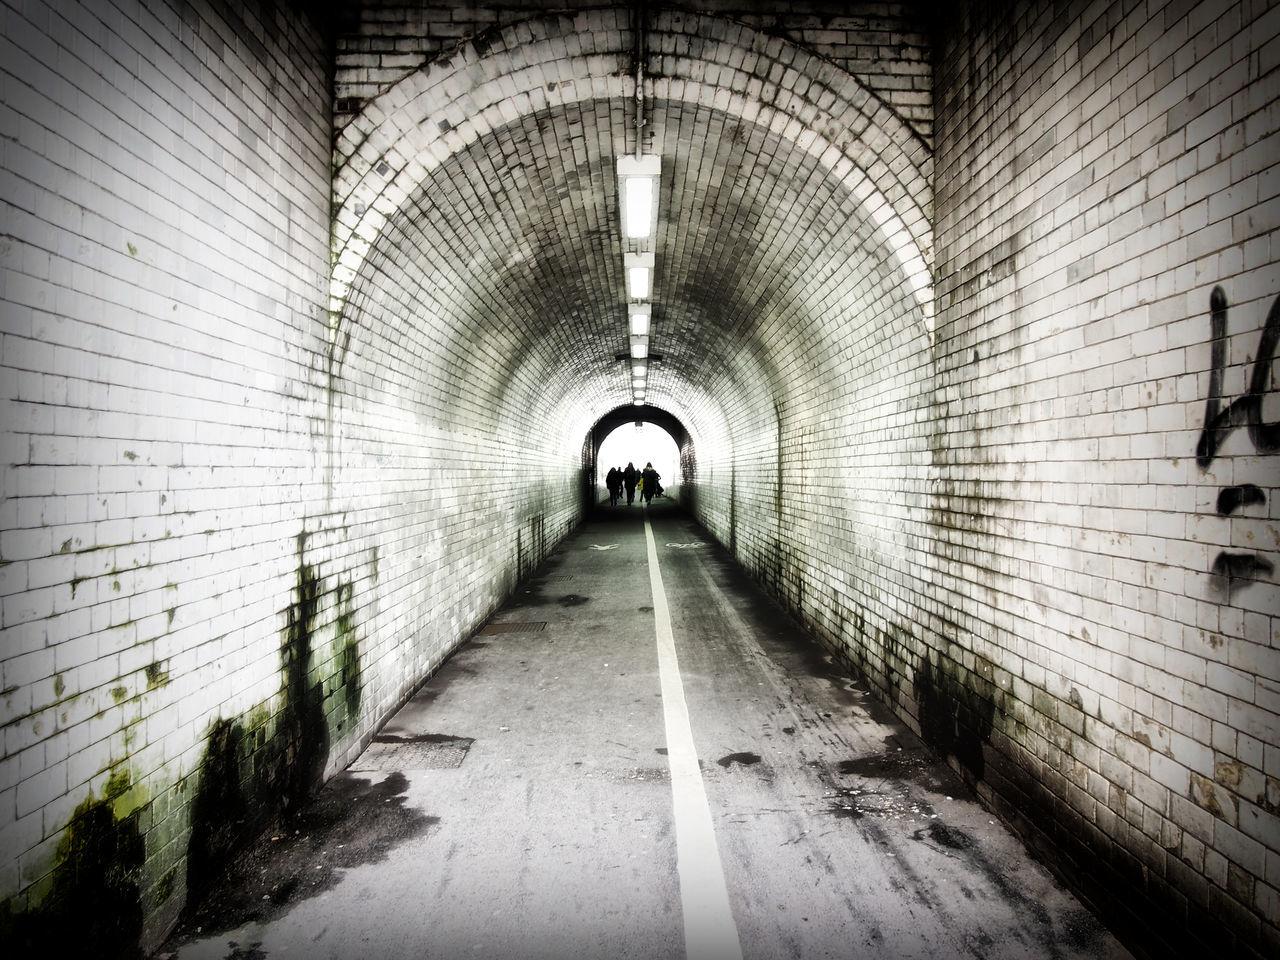 the pedestrian walkway under the railway bridge near york train station Arch Architecture Bridge Goth Gothic Railway Tiles Tunnel Underpass Vicri Walkway York Yrokshir